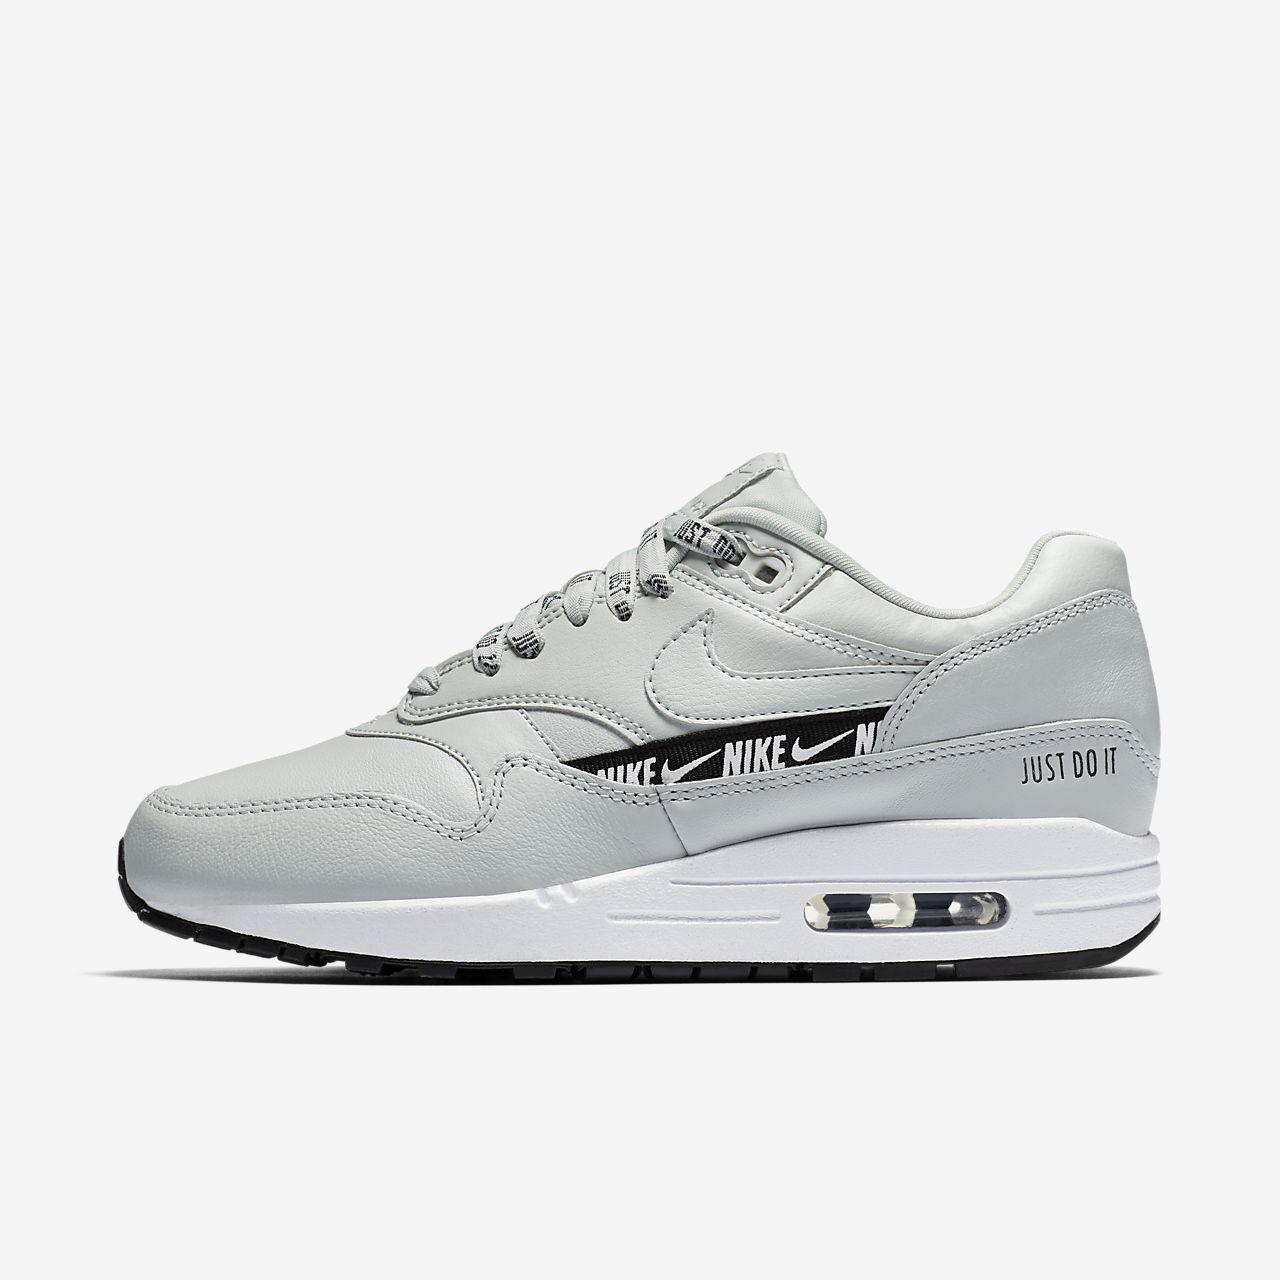 super popular f72c5 42ac6 ... Nike Air Max 1 SE Women s Shoe